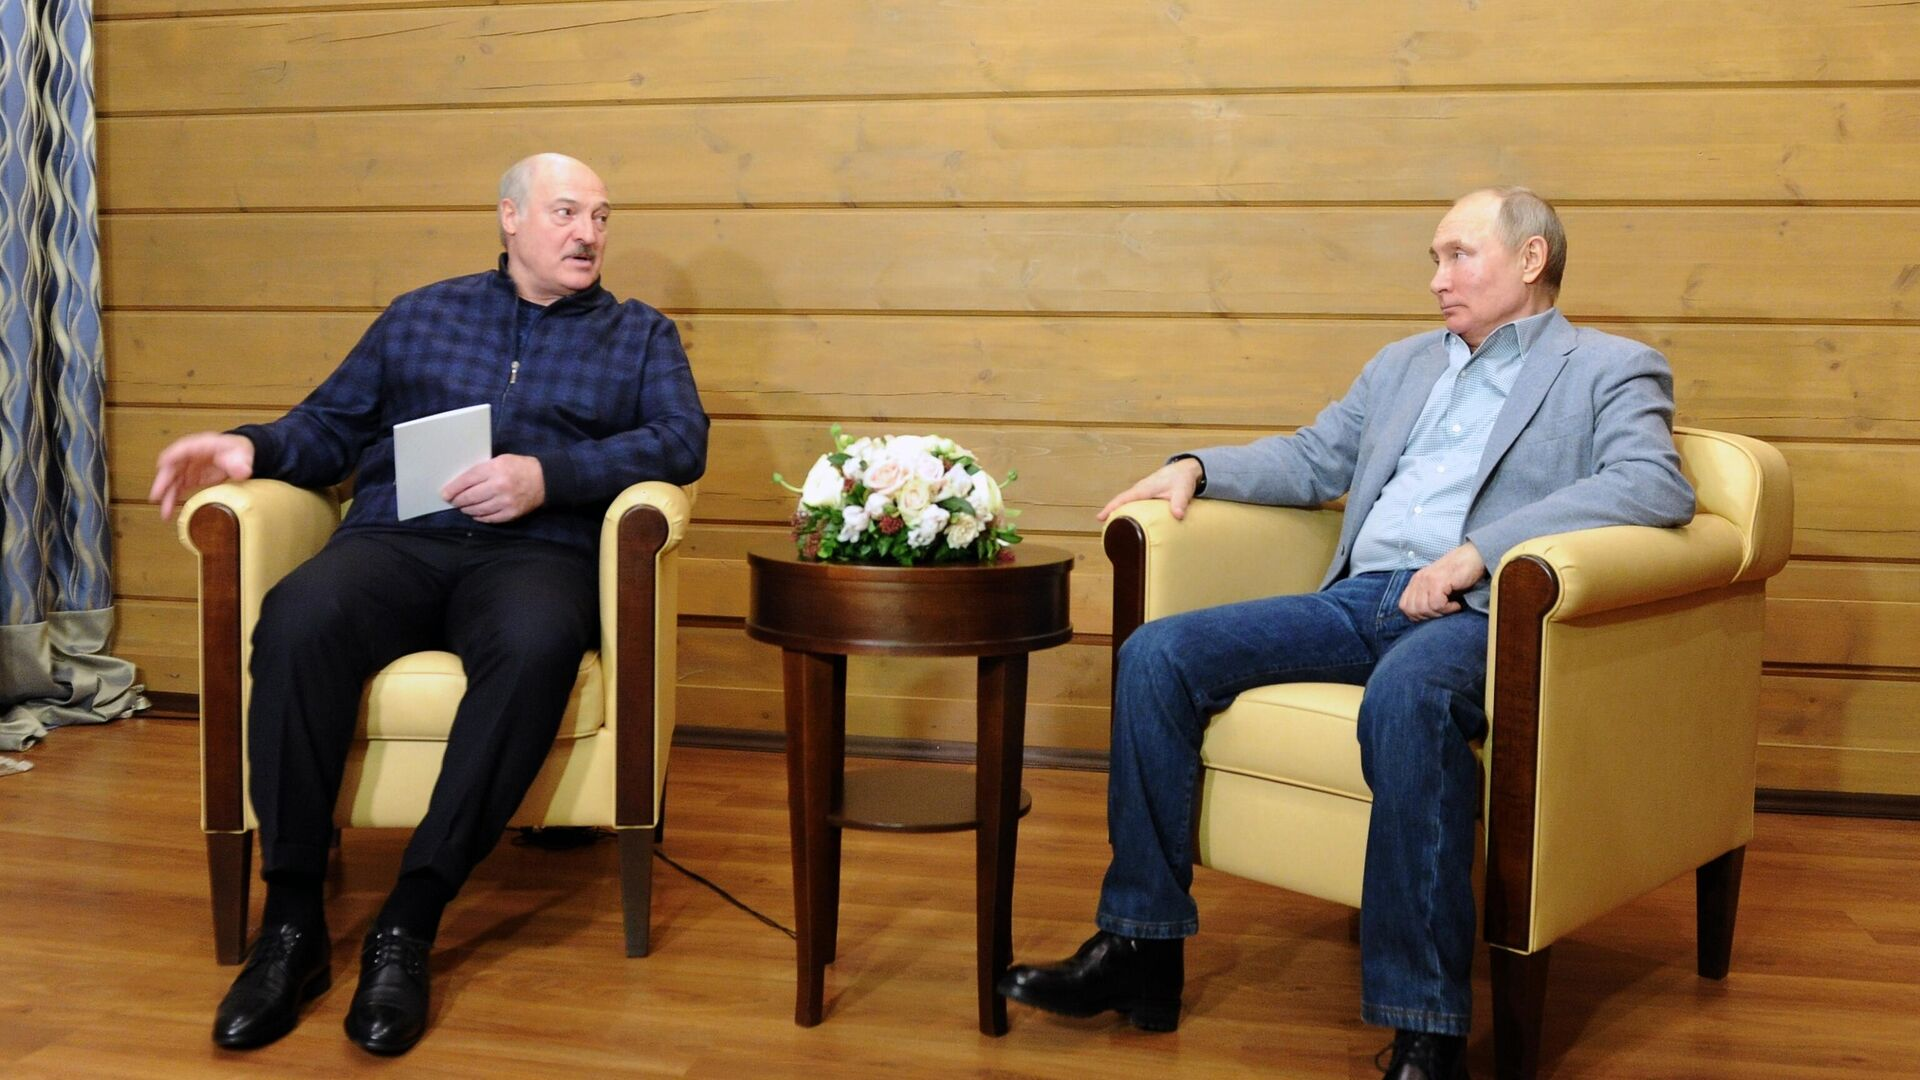 Президент РФ Владимир Путин и президент Белоруссии Александр Лукашенко во время встречи - РИА Новости, 1920, 22.02.2021